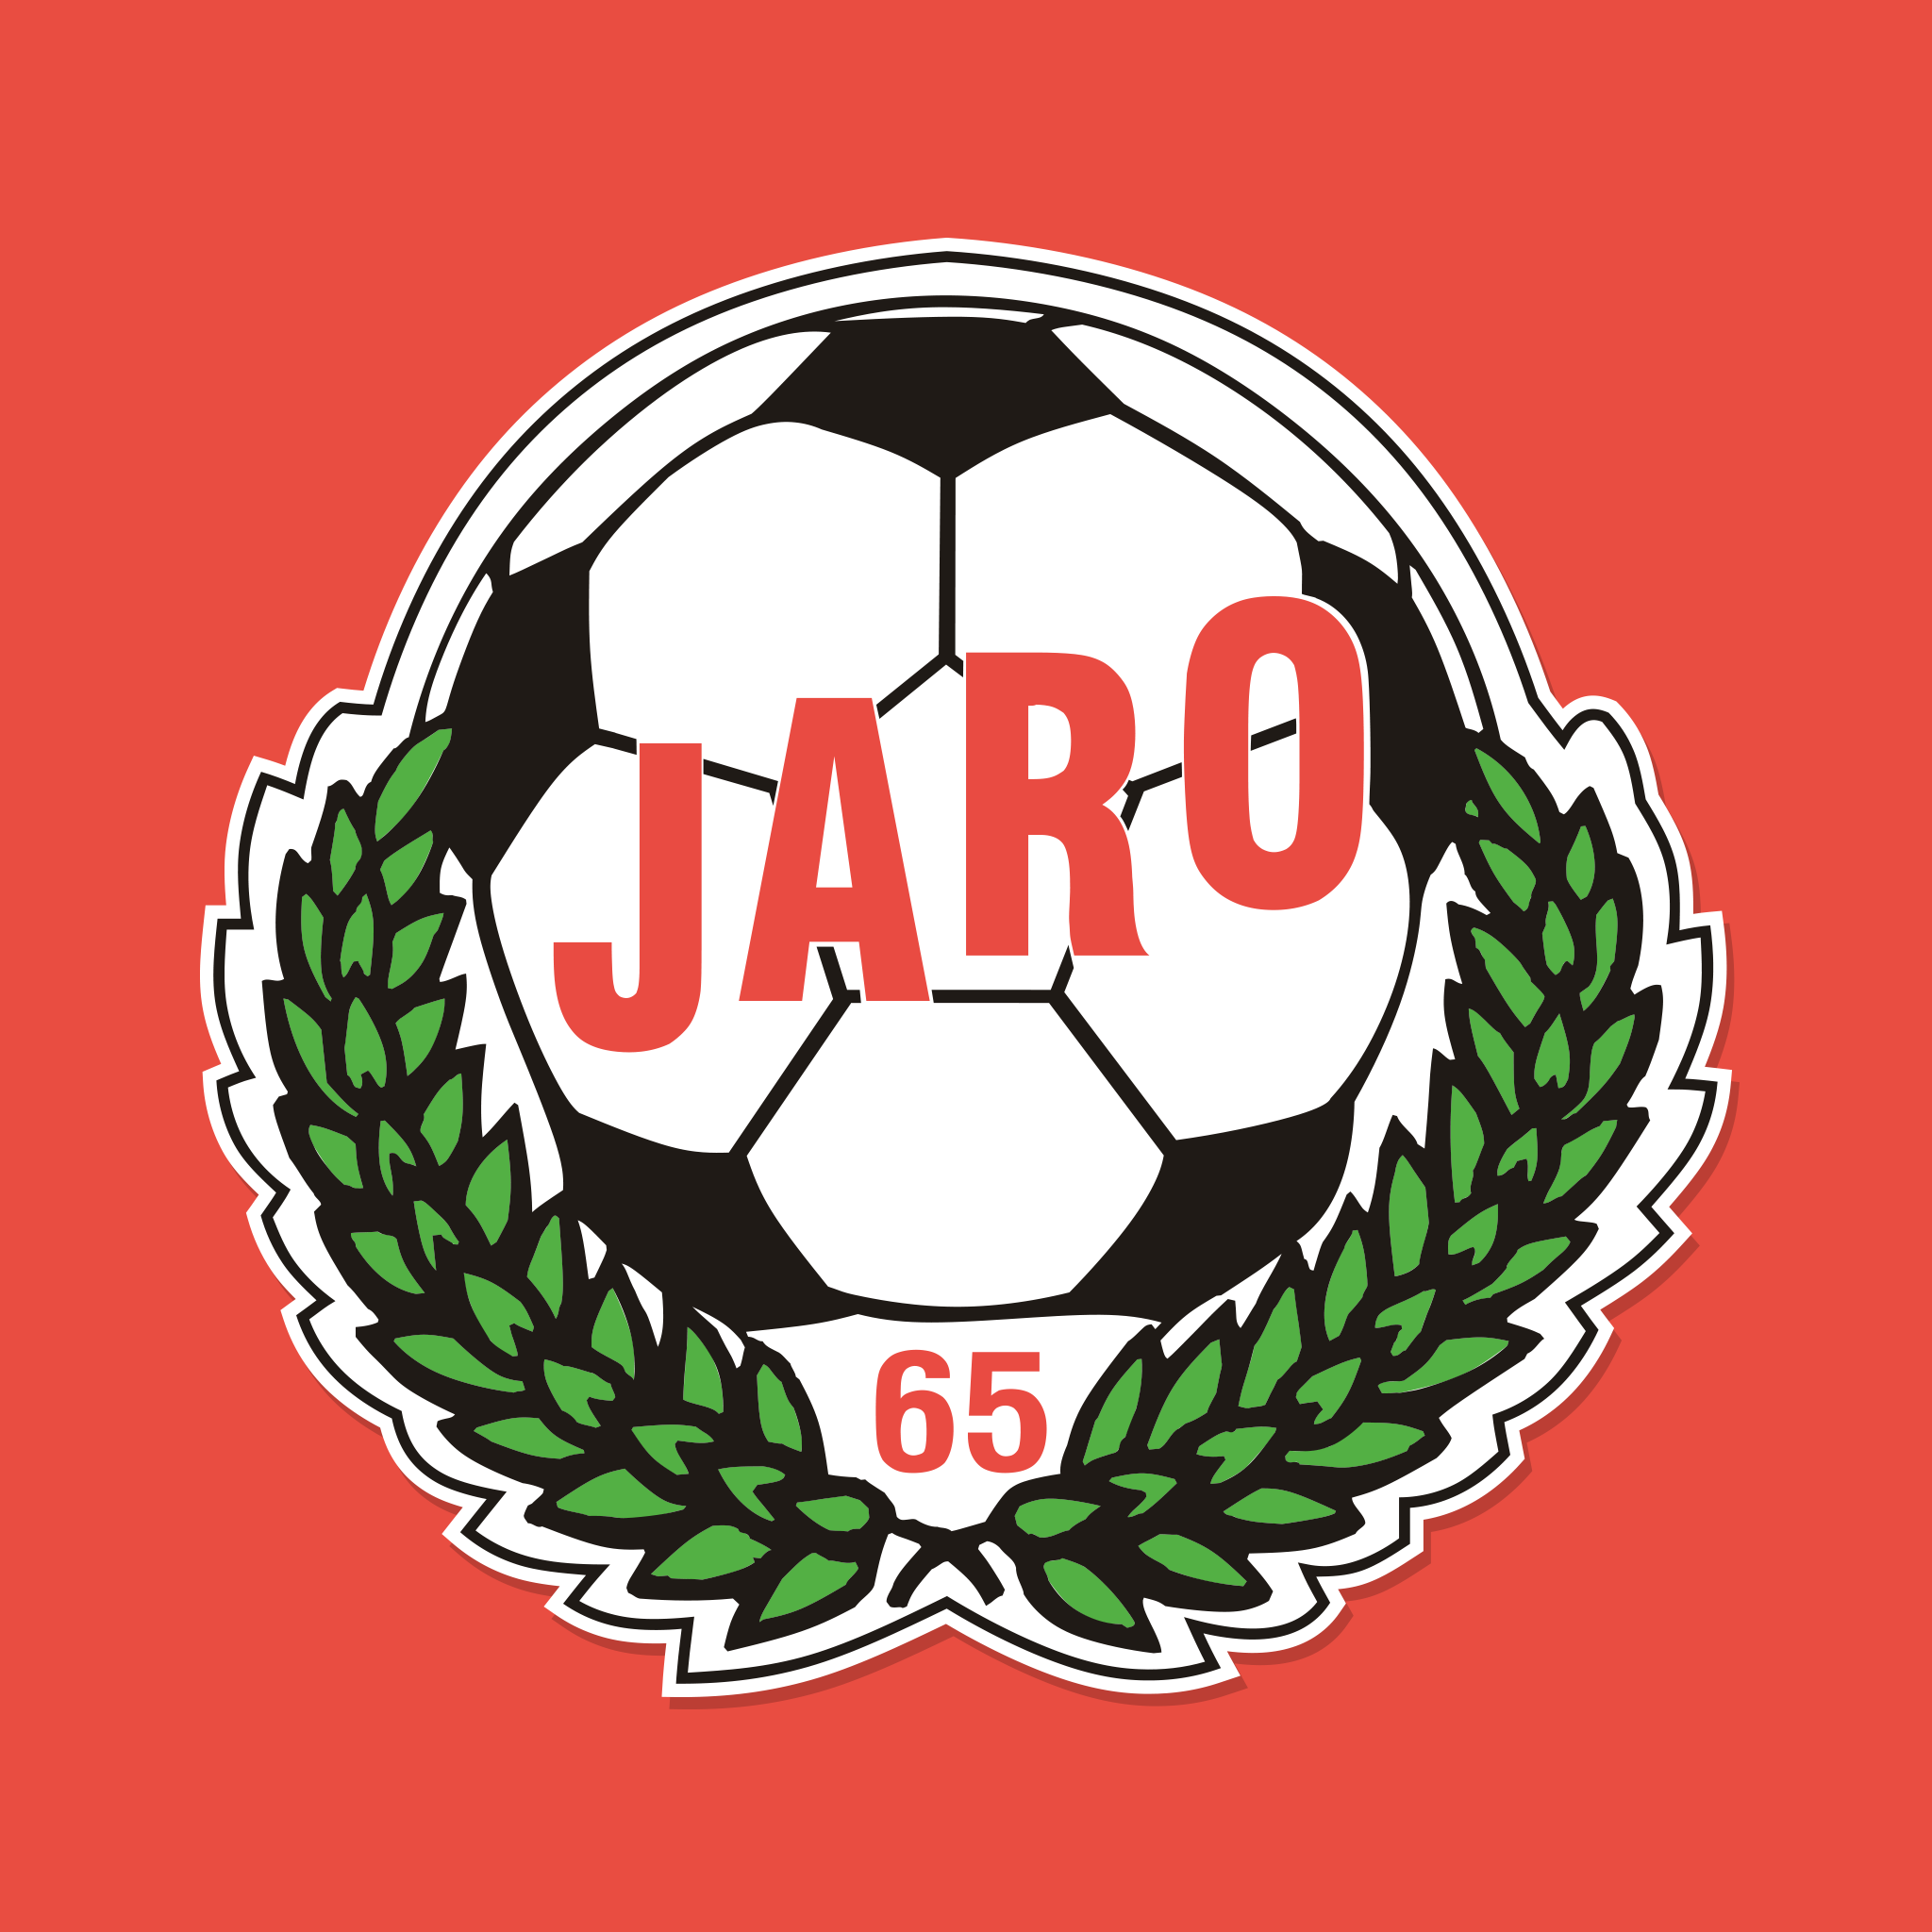 FF Jaro ( FFJaro)  ae40475499